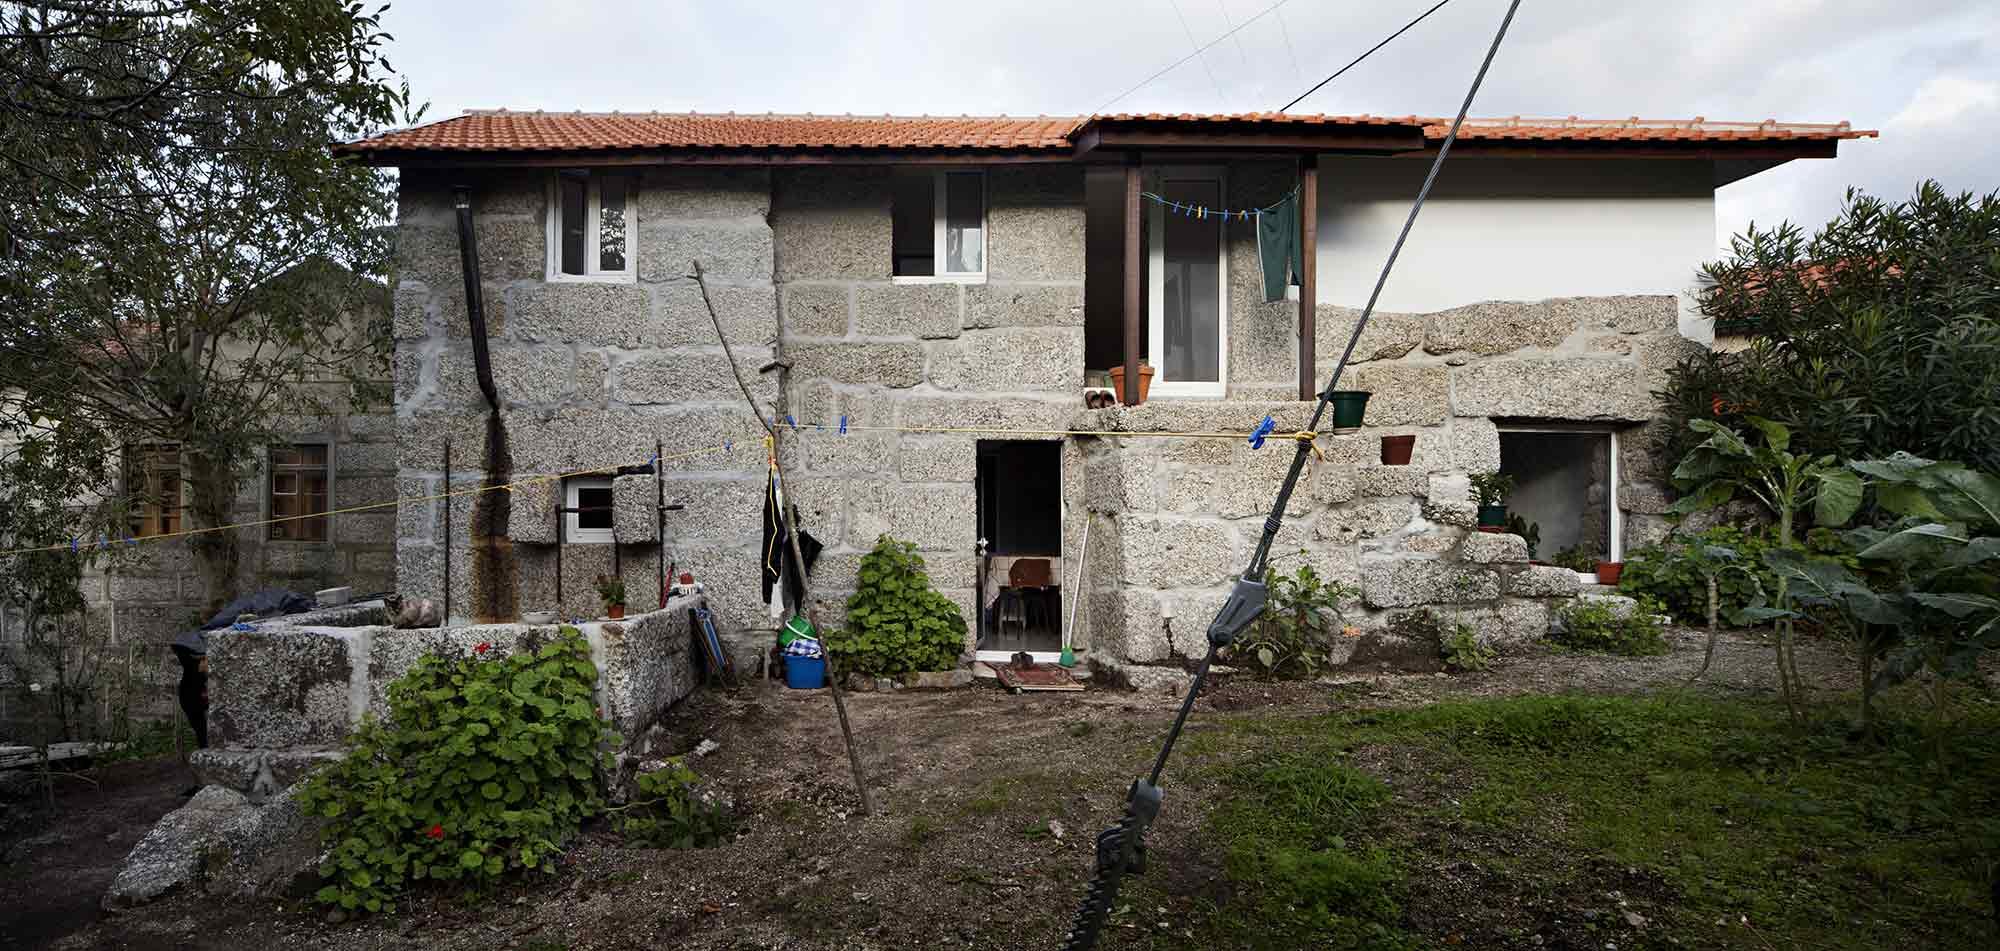 House II|es1arq| Amarante